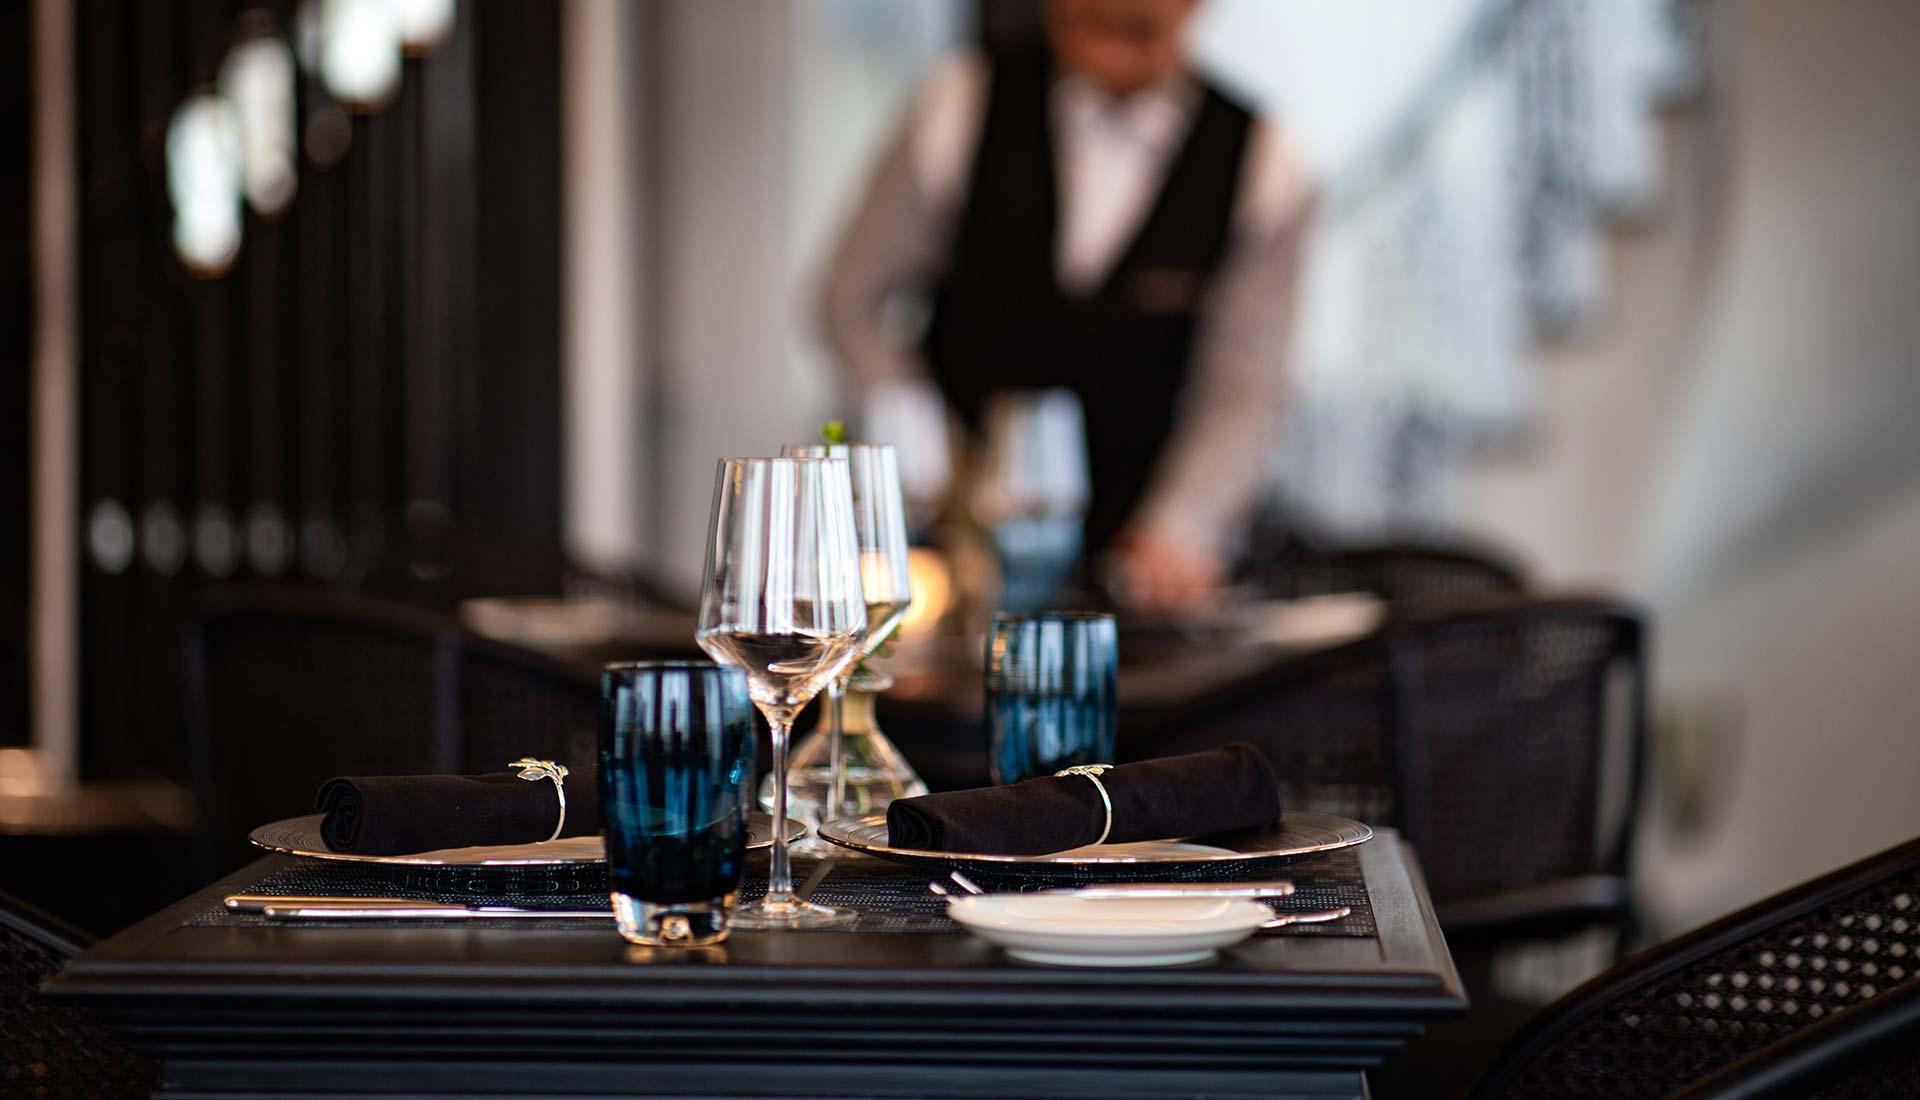 The Rhythms Restaurant - Special Offers